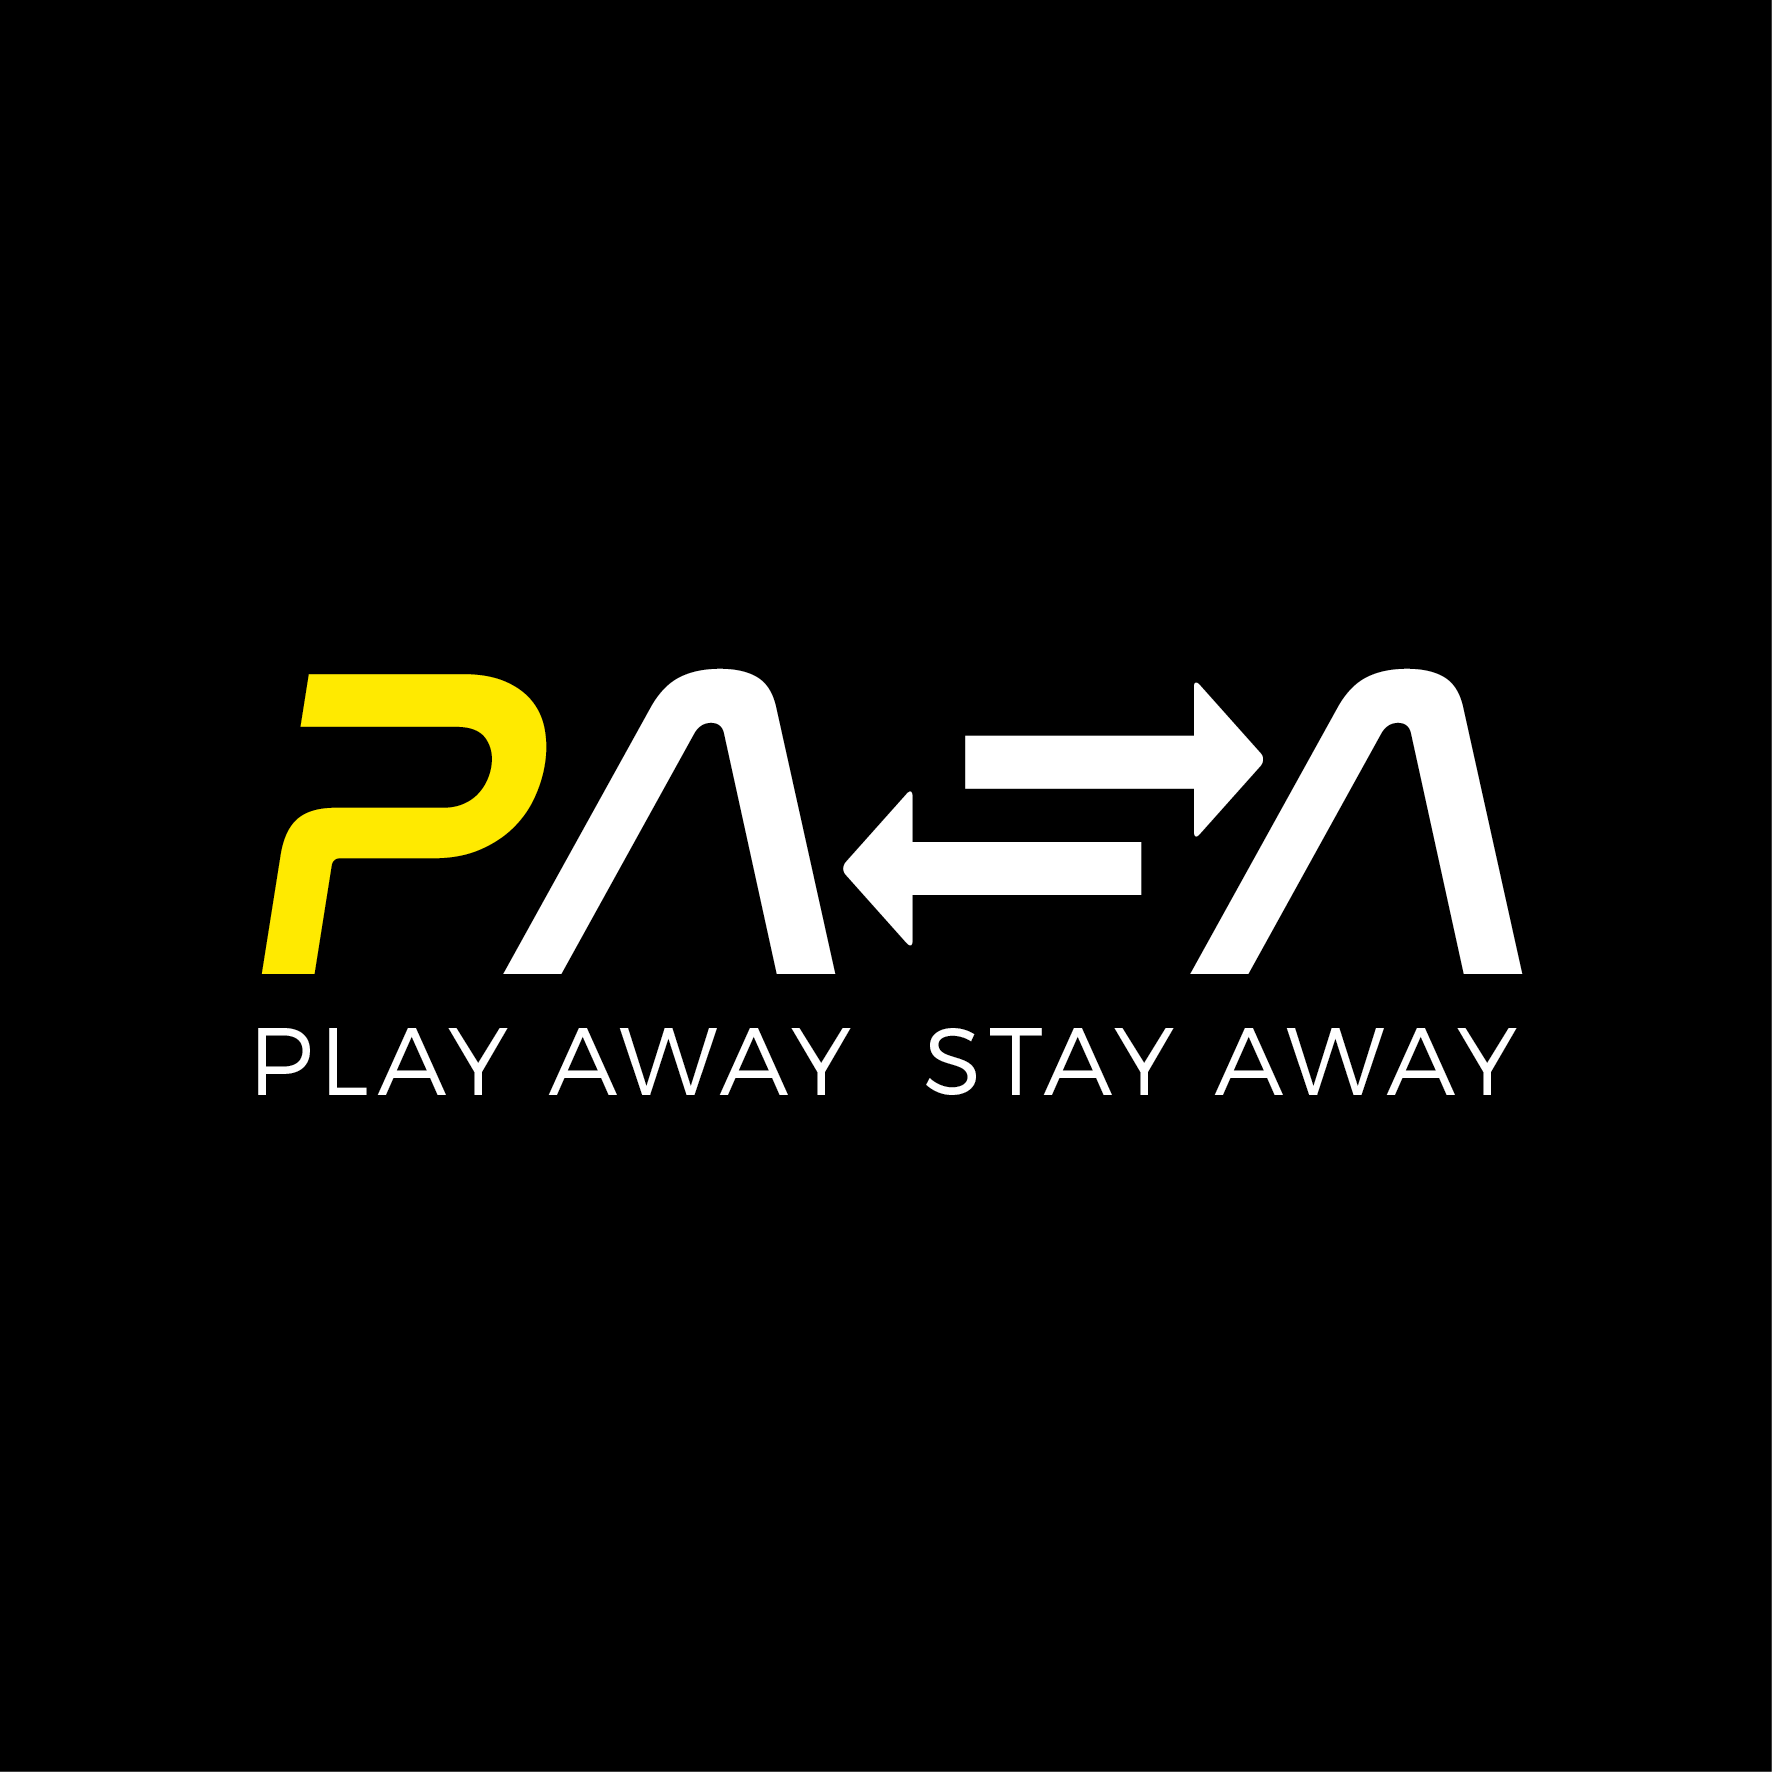 play-away-stay-away